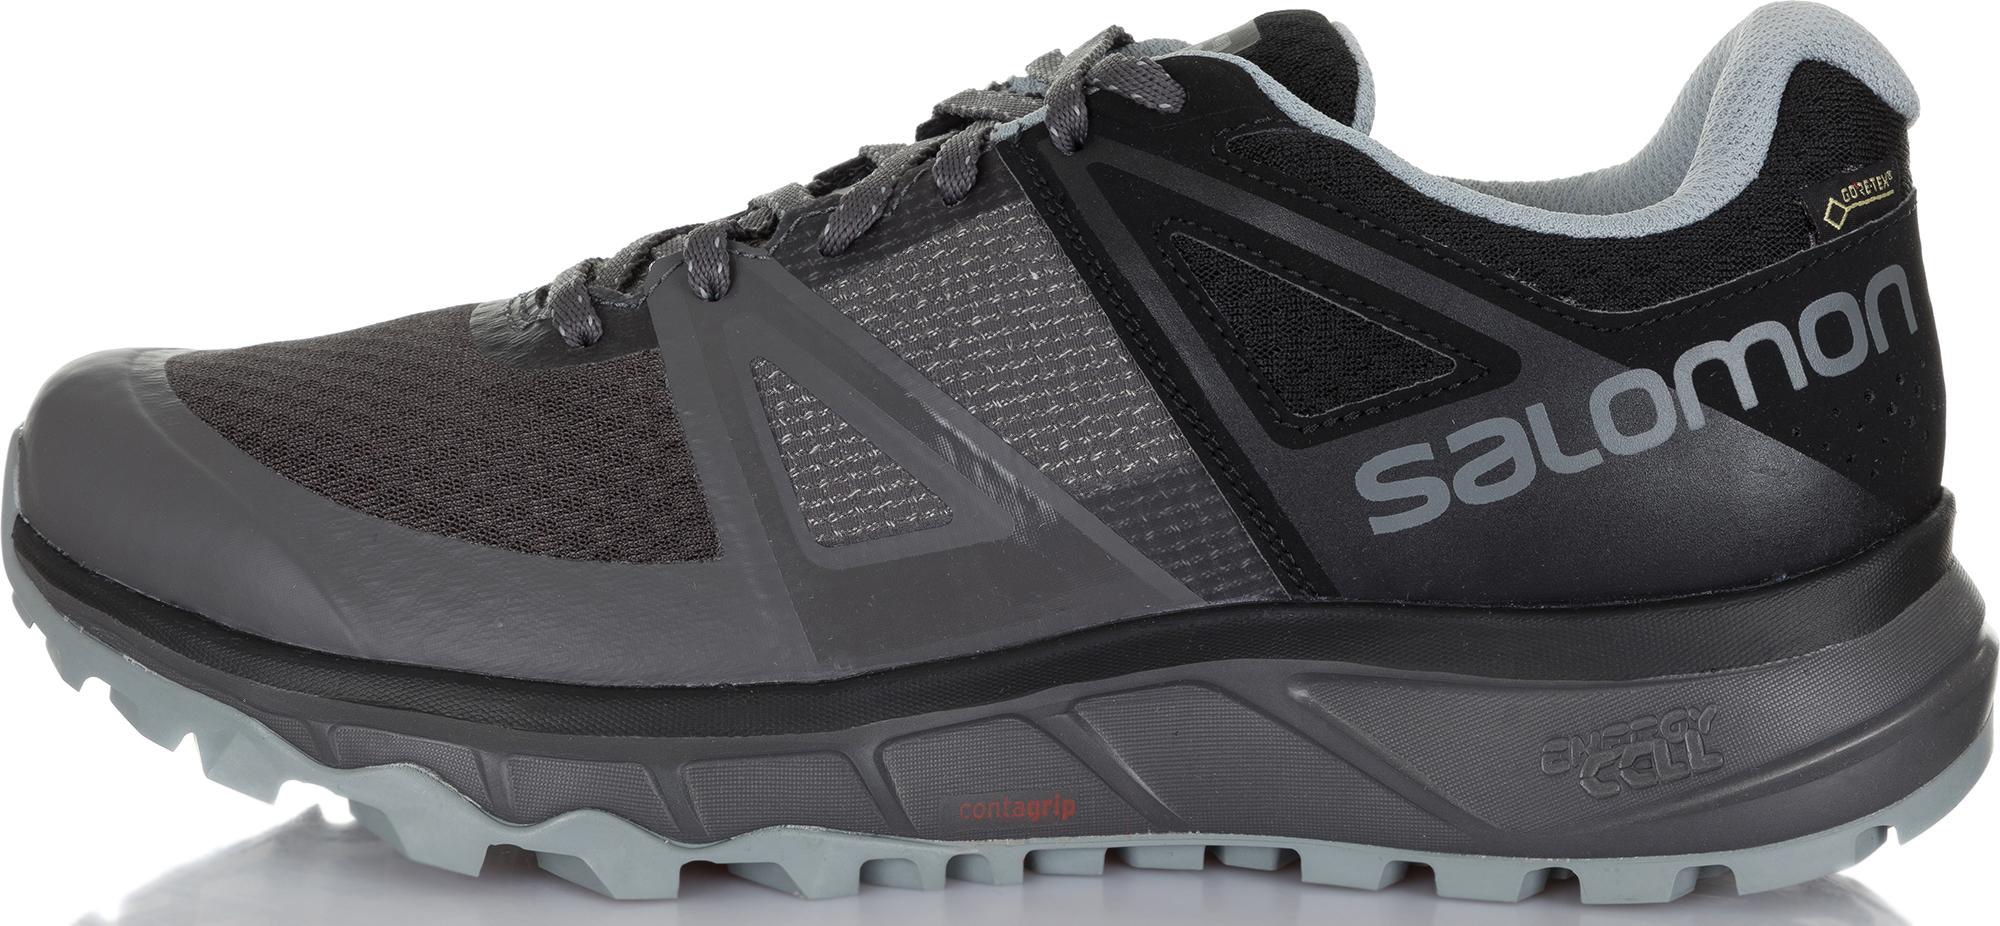 Salomon Кроссовки мужские Salomon Trailster Gtx, размер 40 ботинки мужские salomon ultra mid gore tex